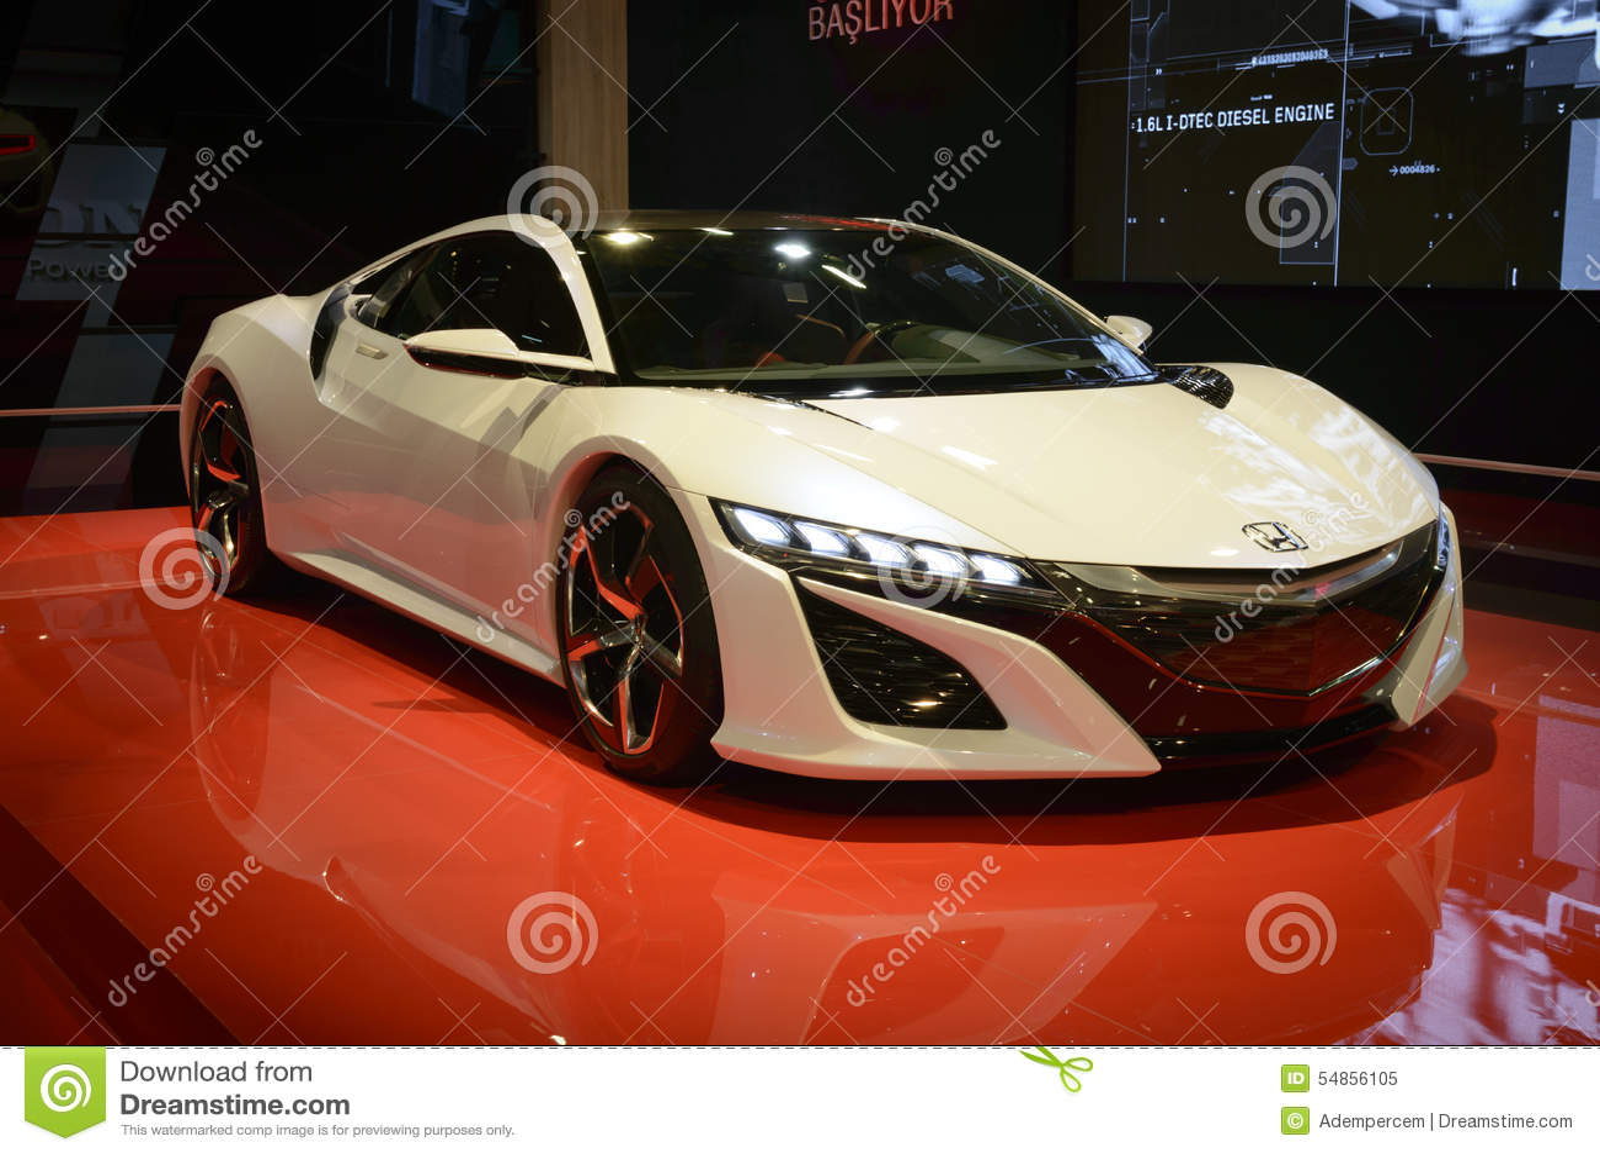 Honda Nsx Concept Car Editorial Image Image Of Exclusive 54856105